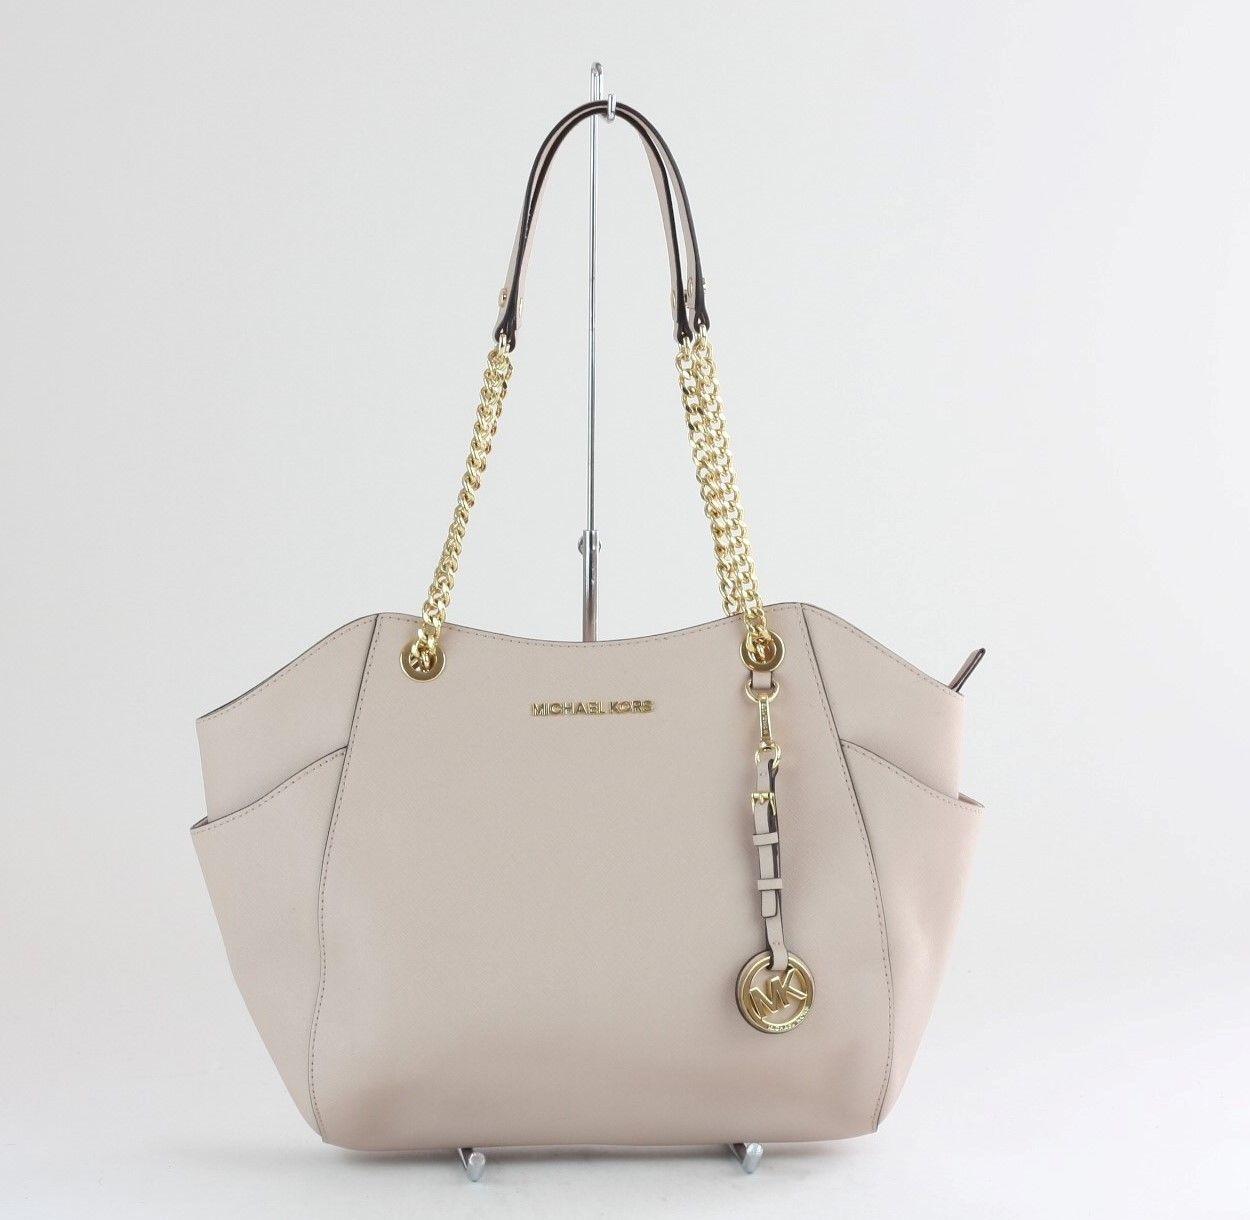 b89eeecc6223 MICHAEL KORS Ballet Saffiano Leather Jet Set Travel Large Shoulder Bag  $98.01